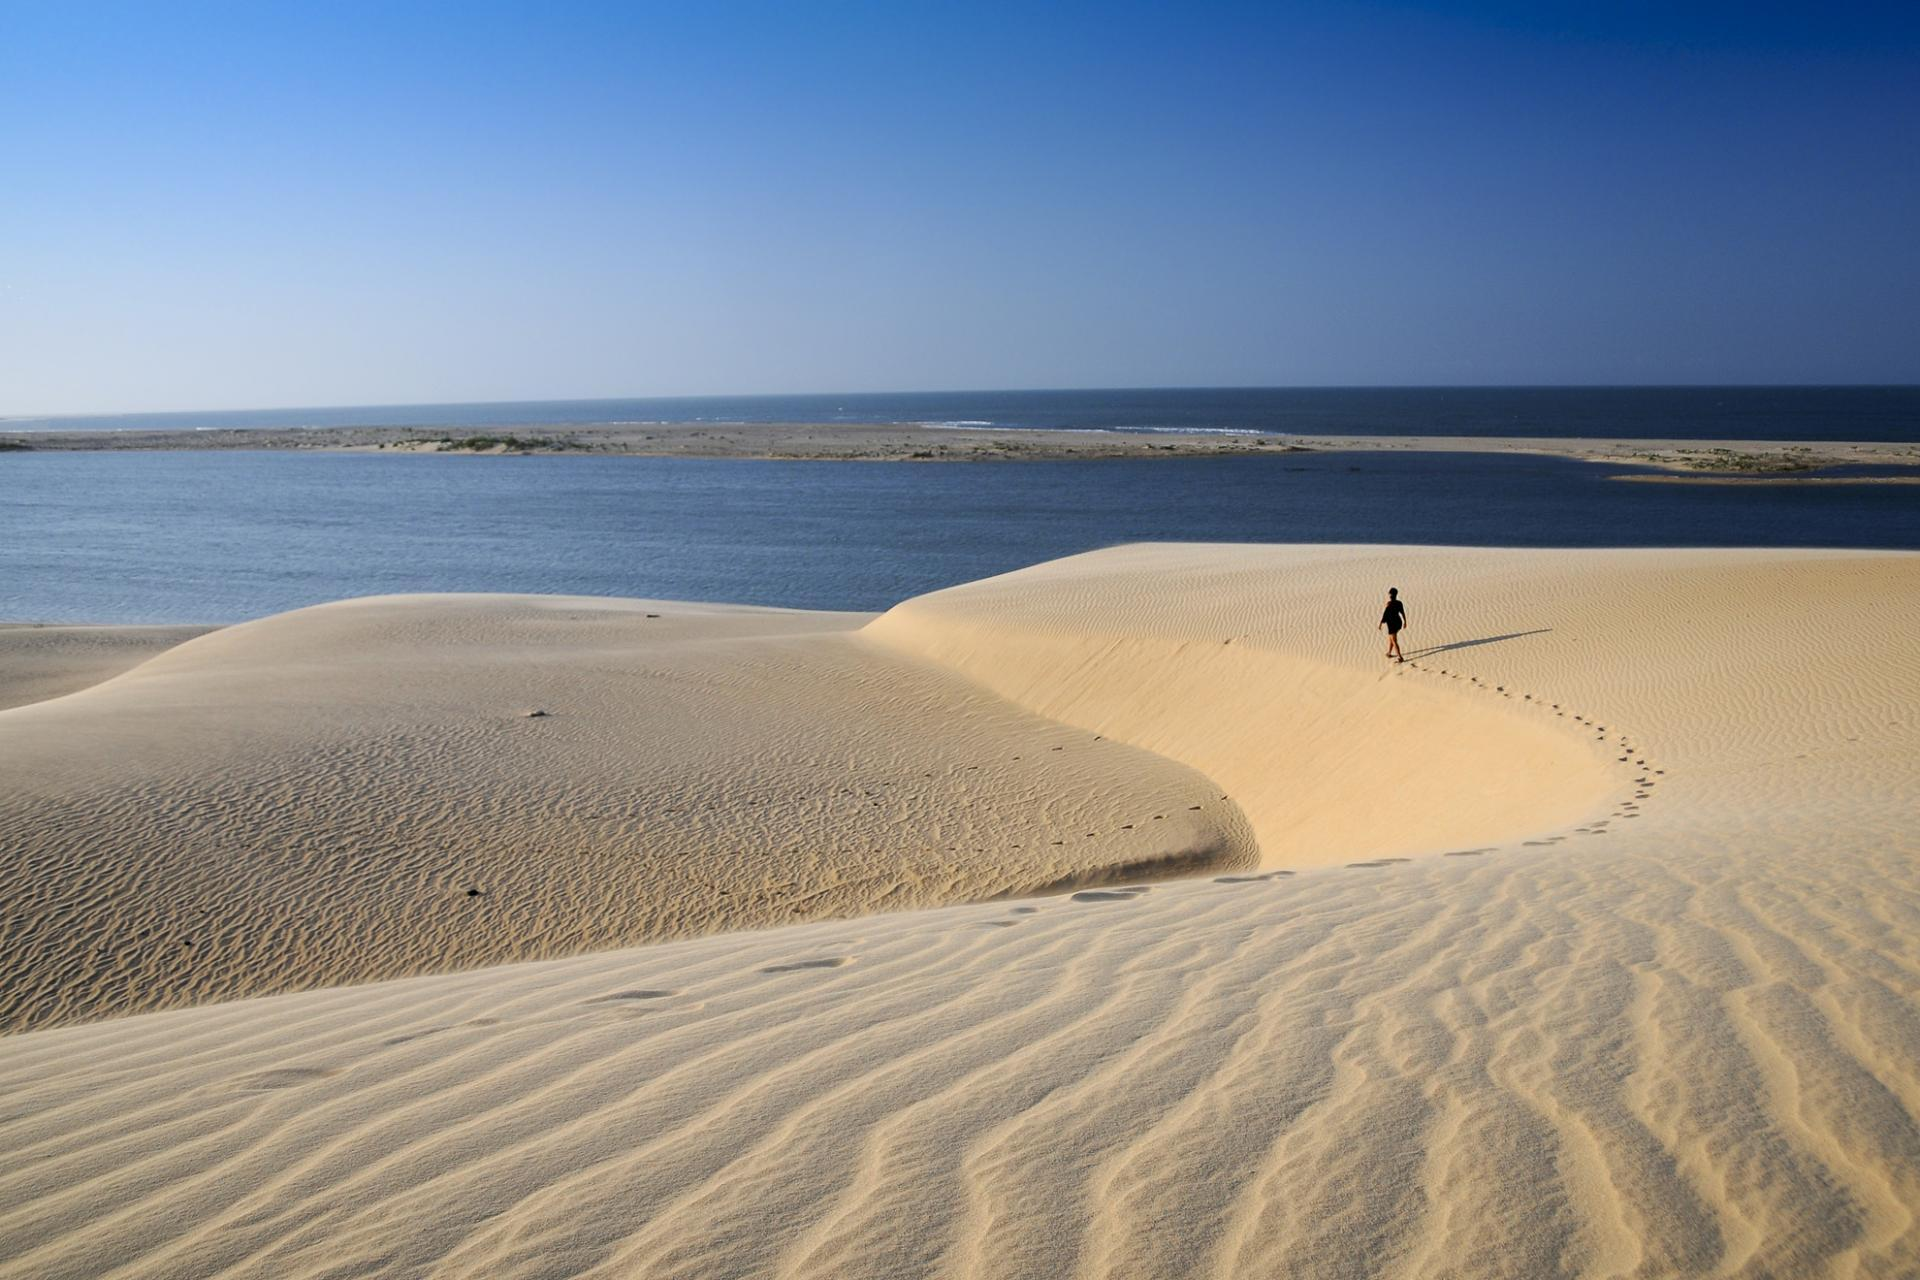 Eco-tourist enjoying the dunes of Lencois Maranhenses